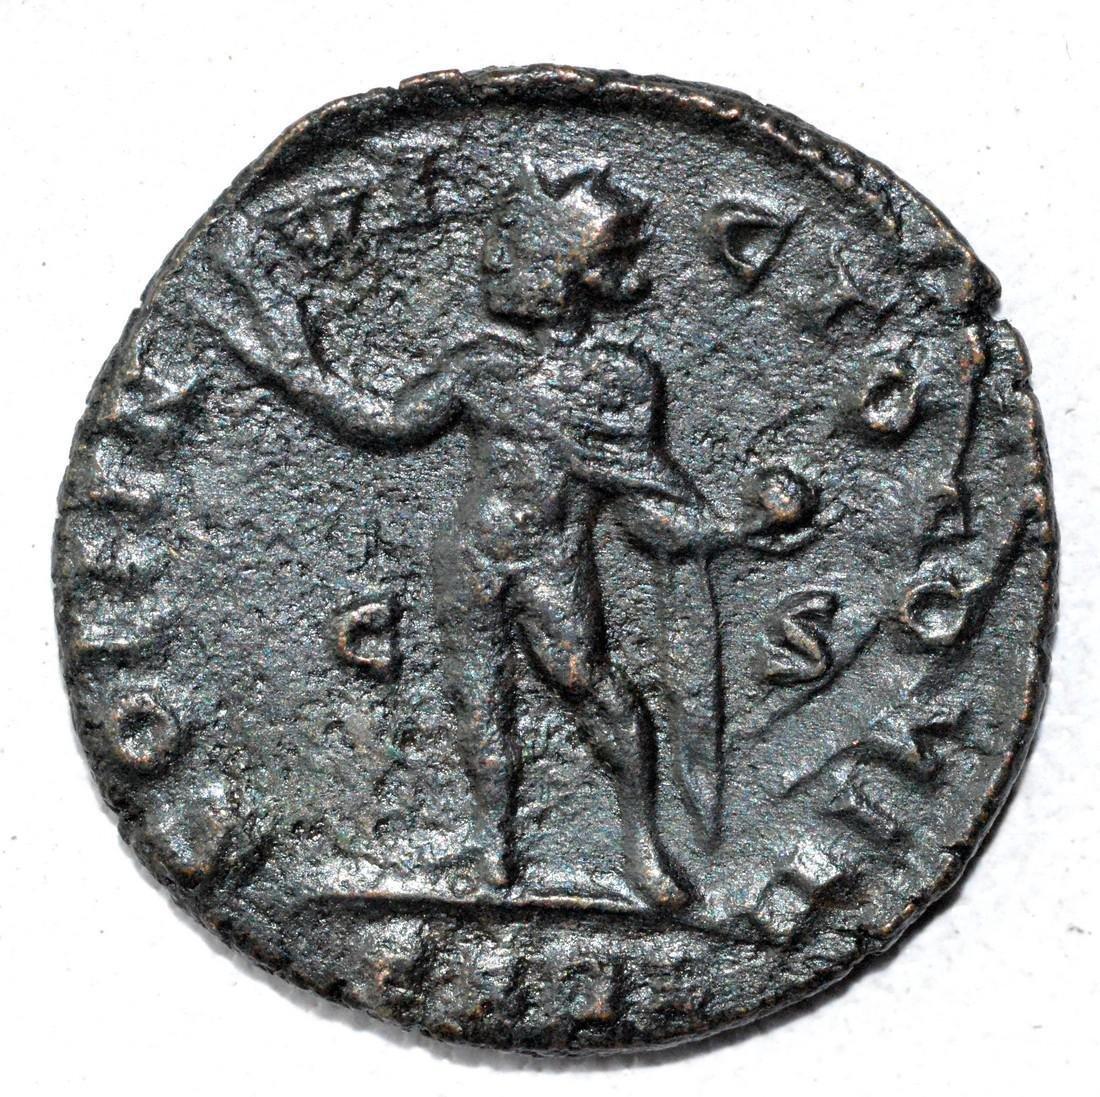 Ancient Roman Follis Coin - Constantius I - 2